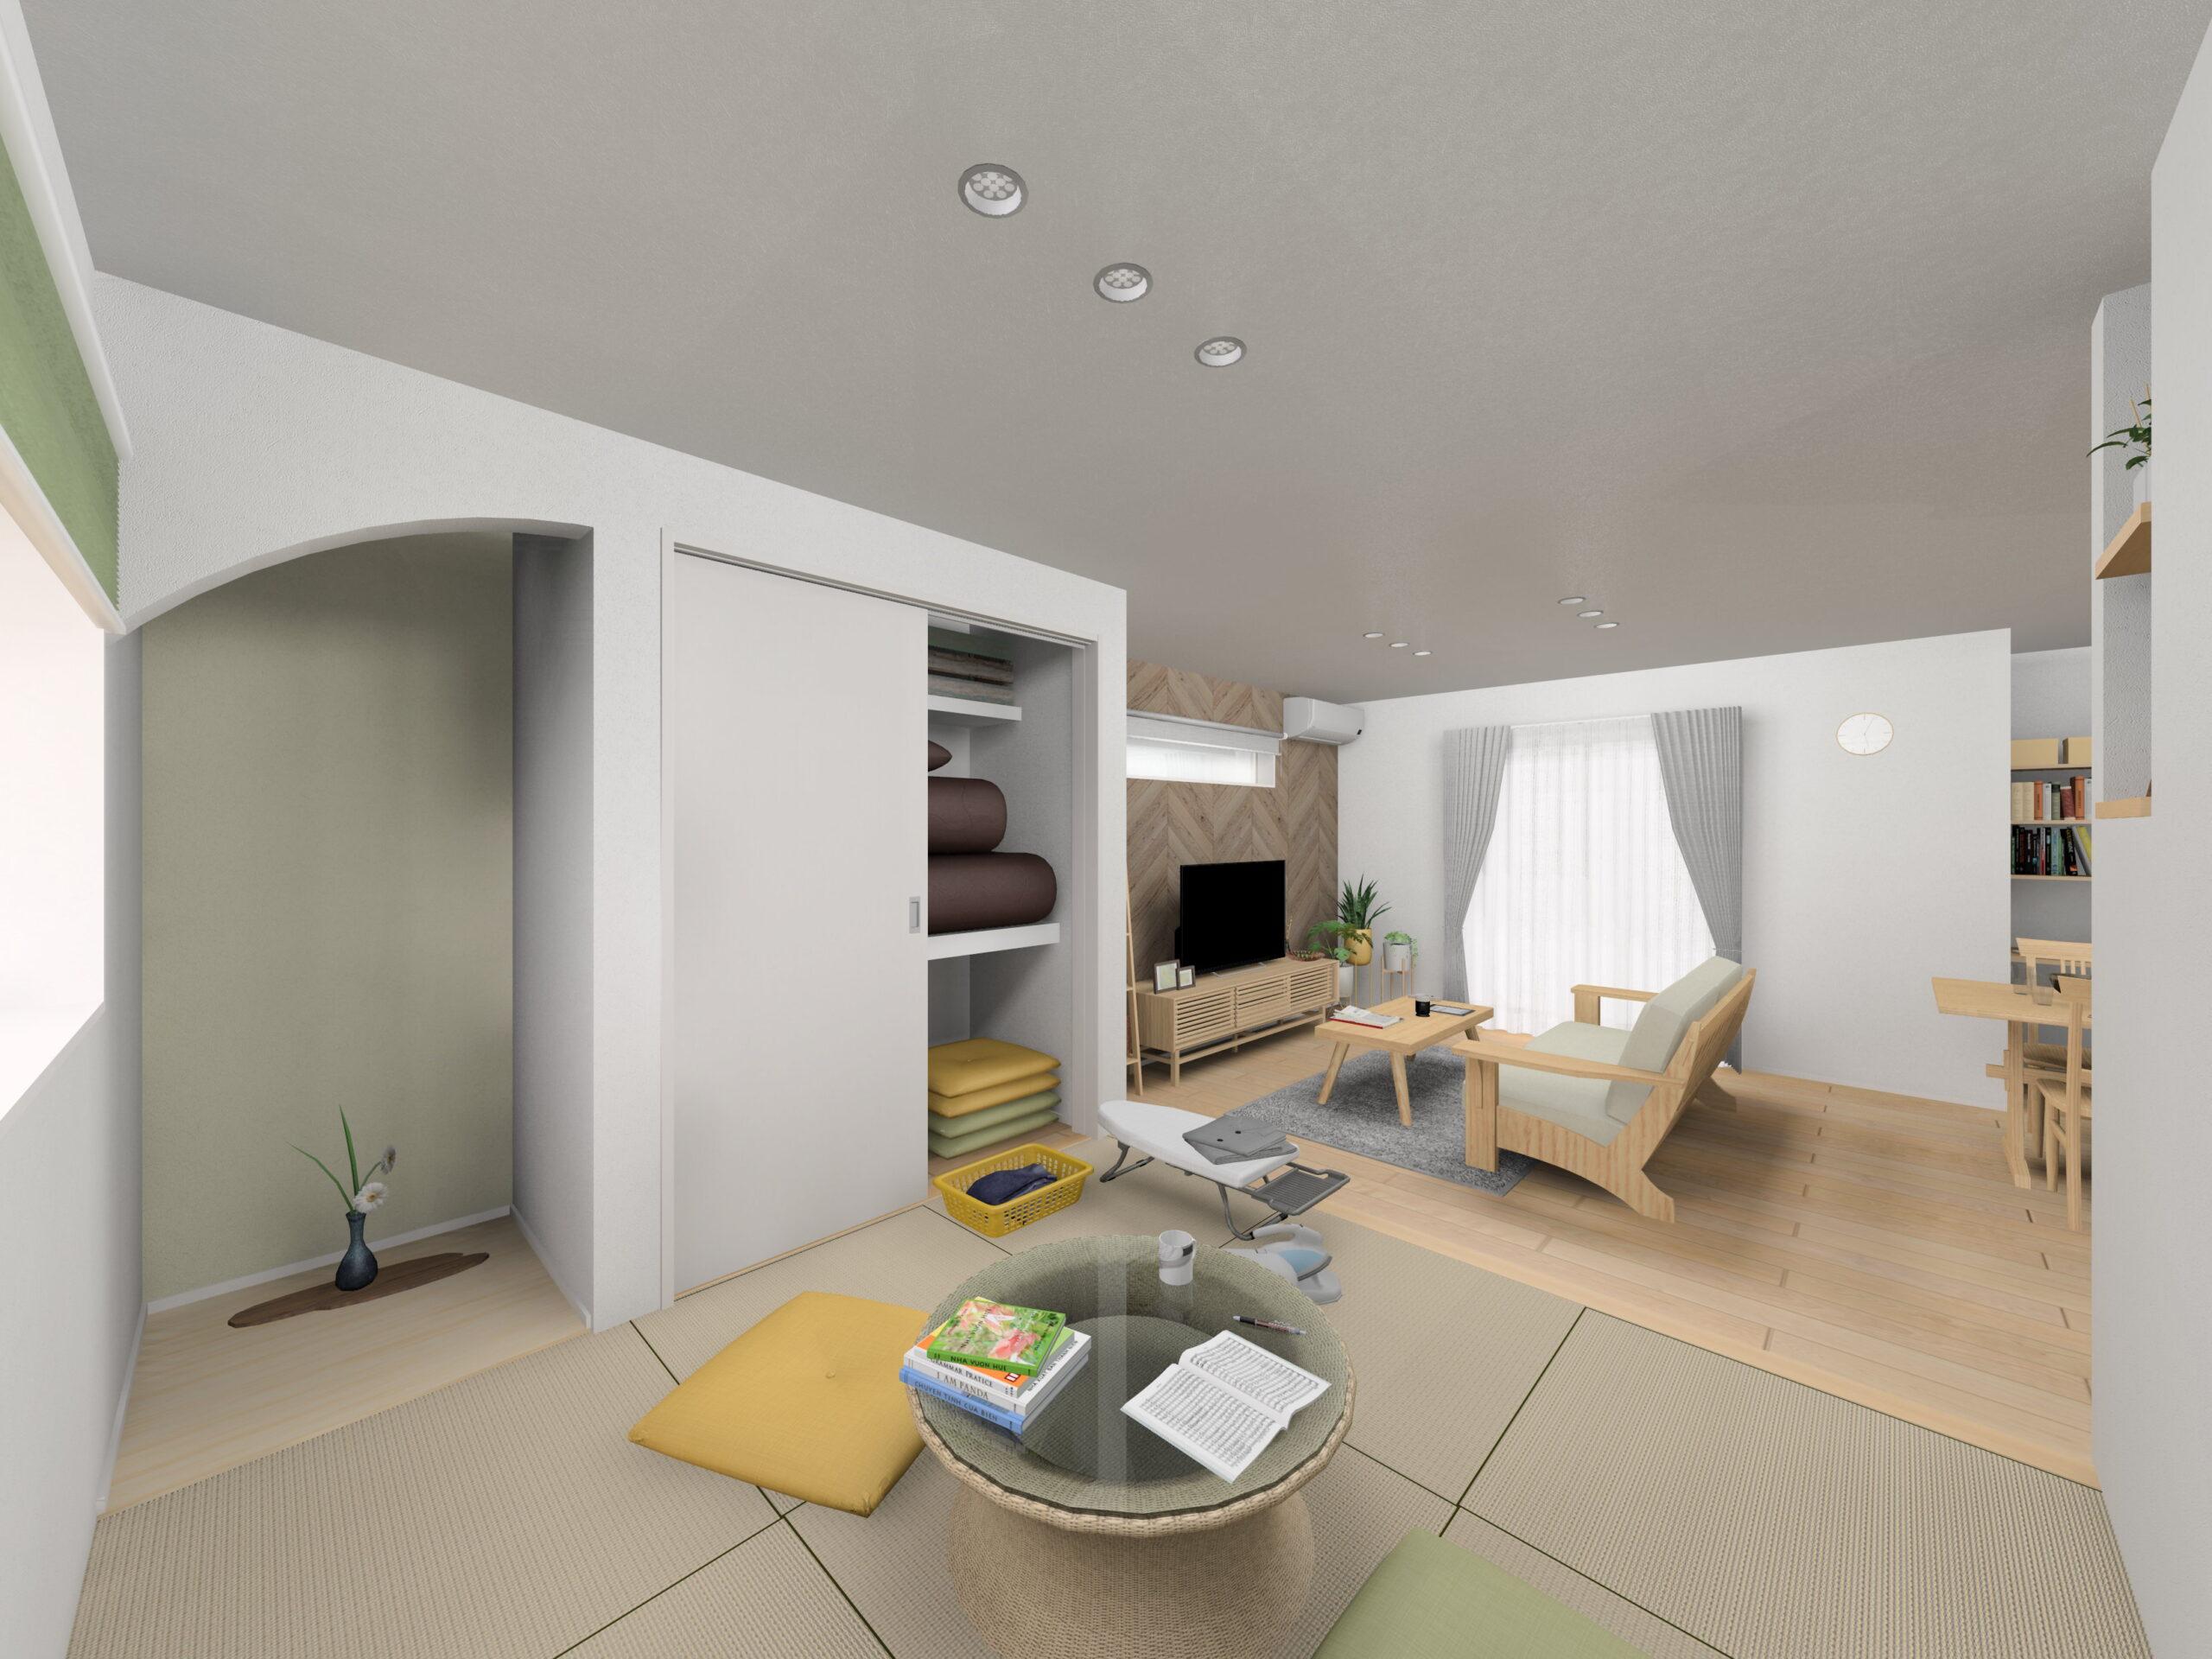 嬉野市新築建売住宅「OURS下野2号地」和室パース